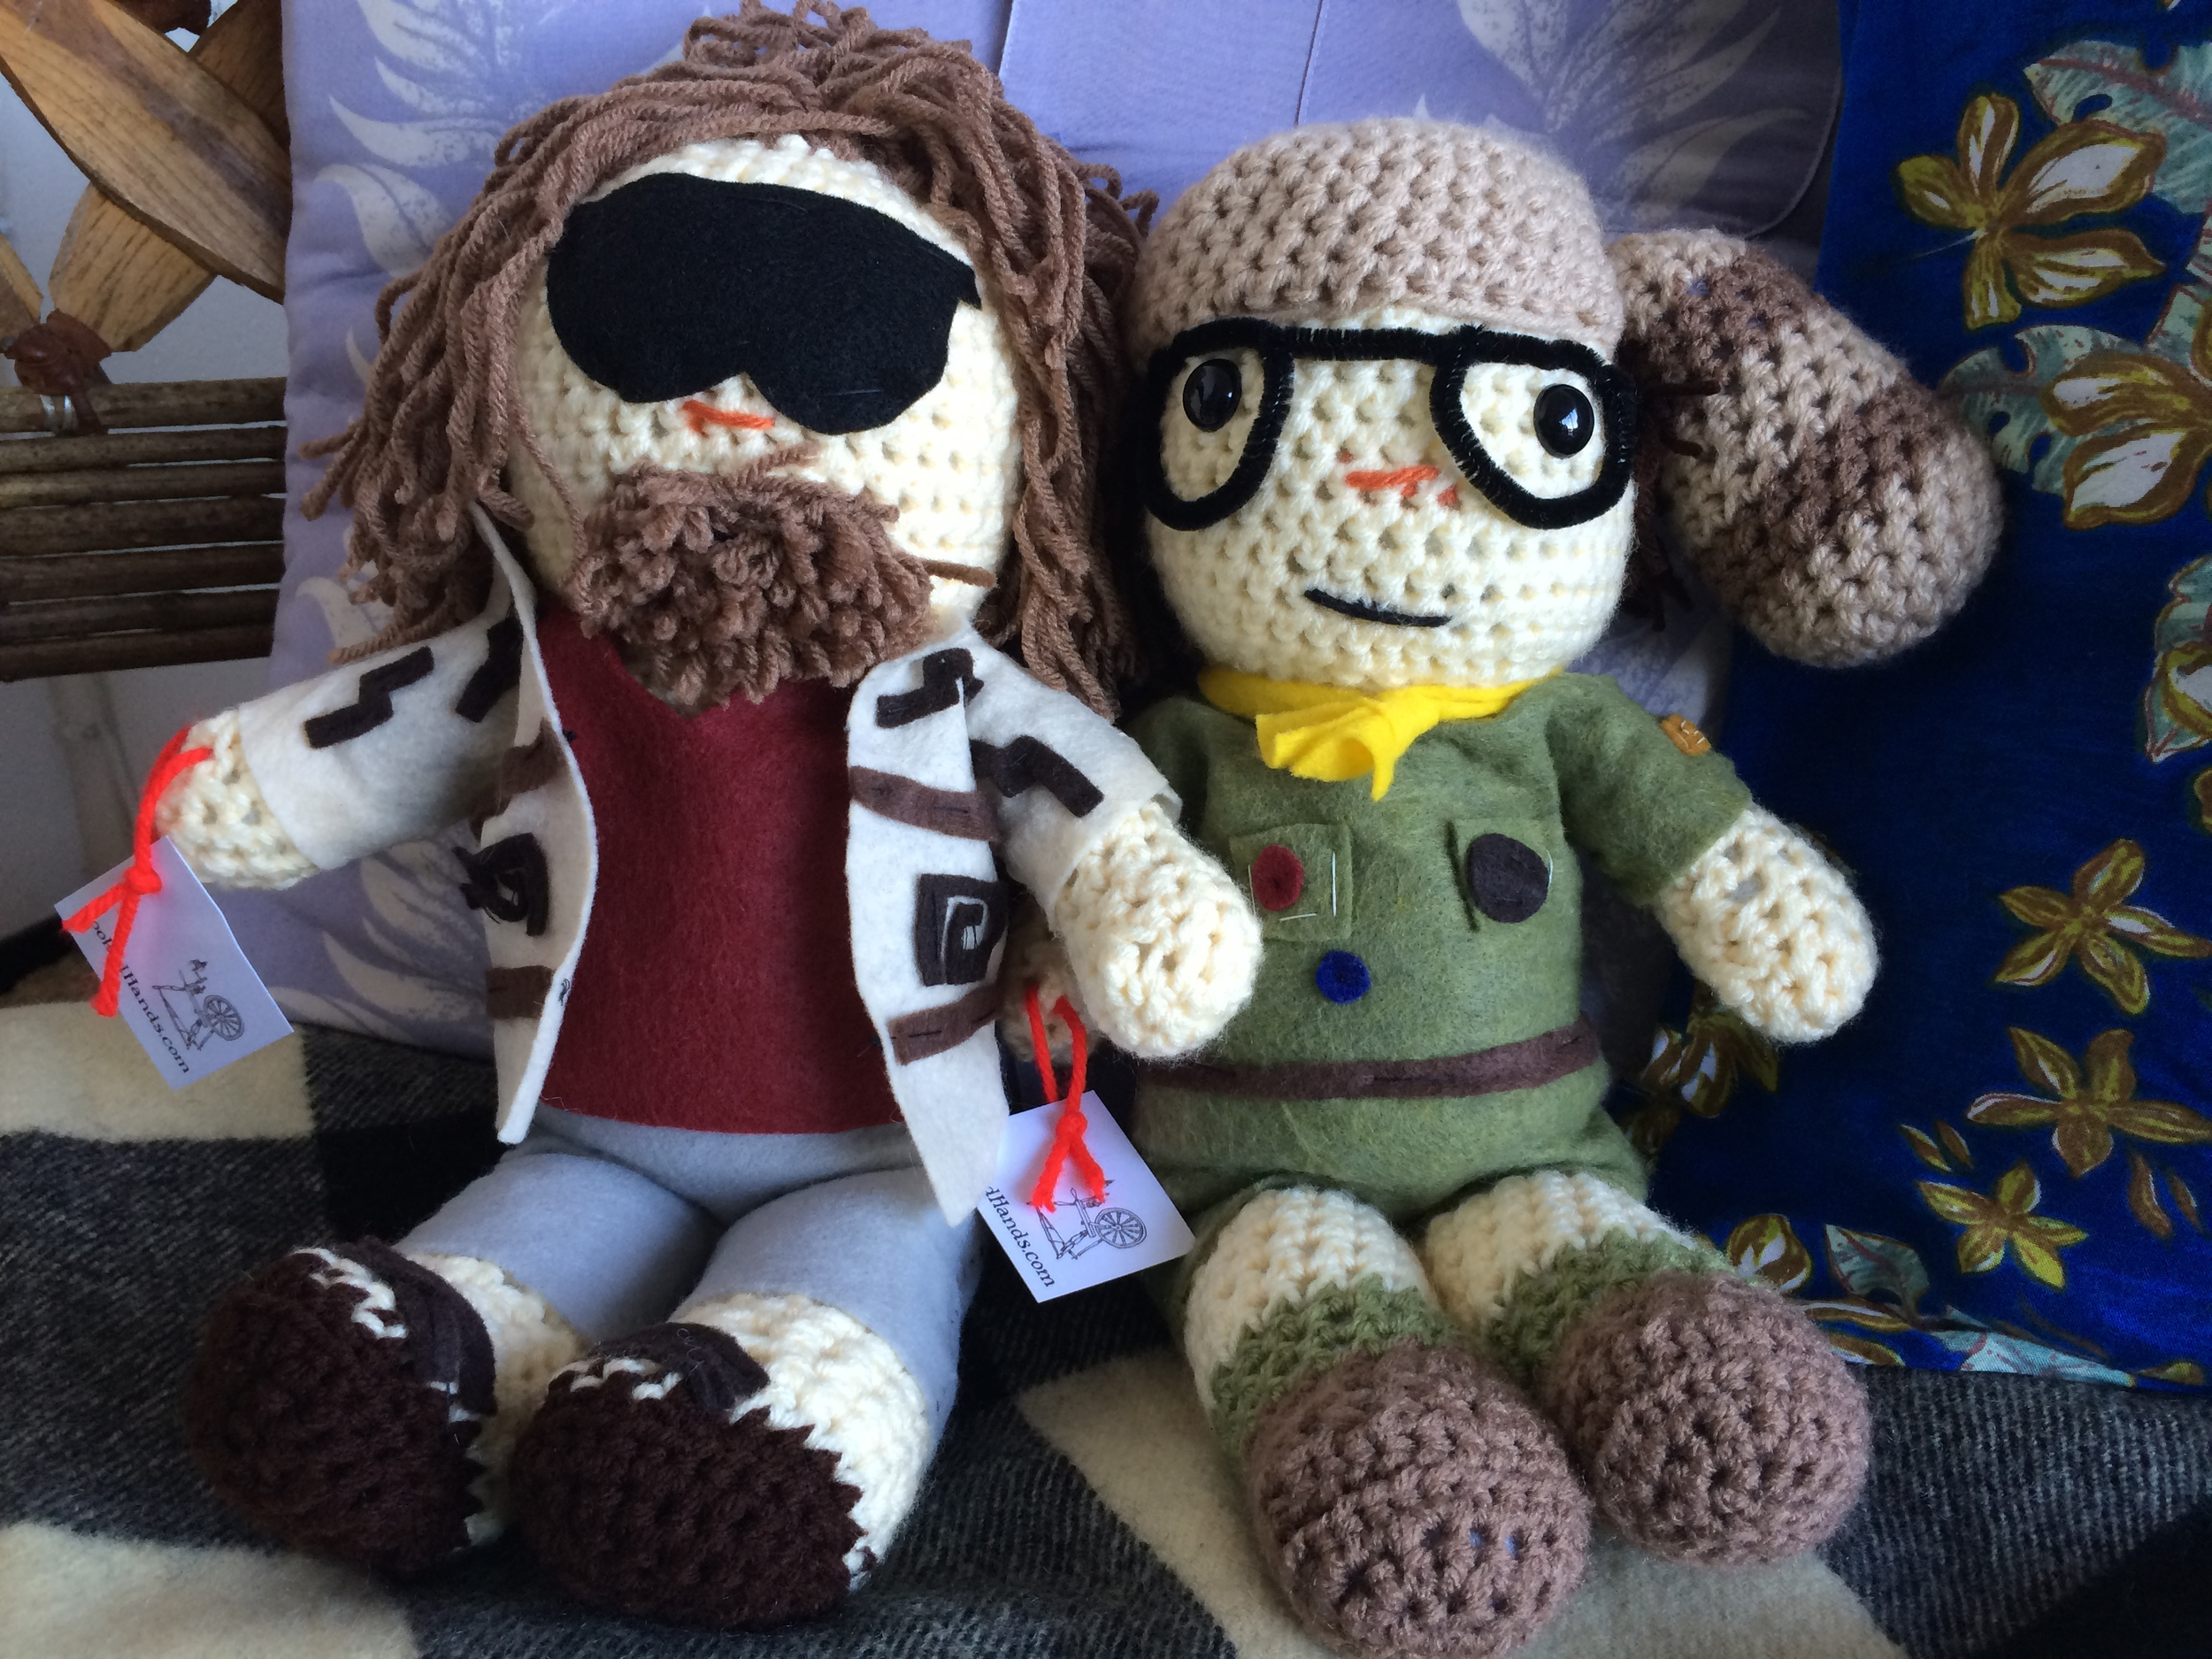 the-dude-crochet-gift-guide-venice